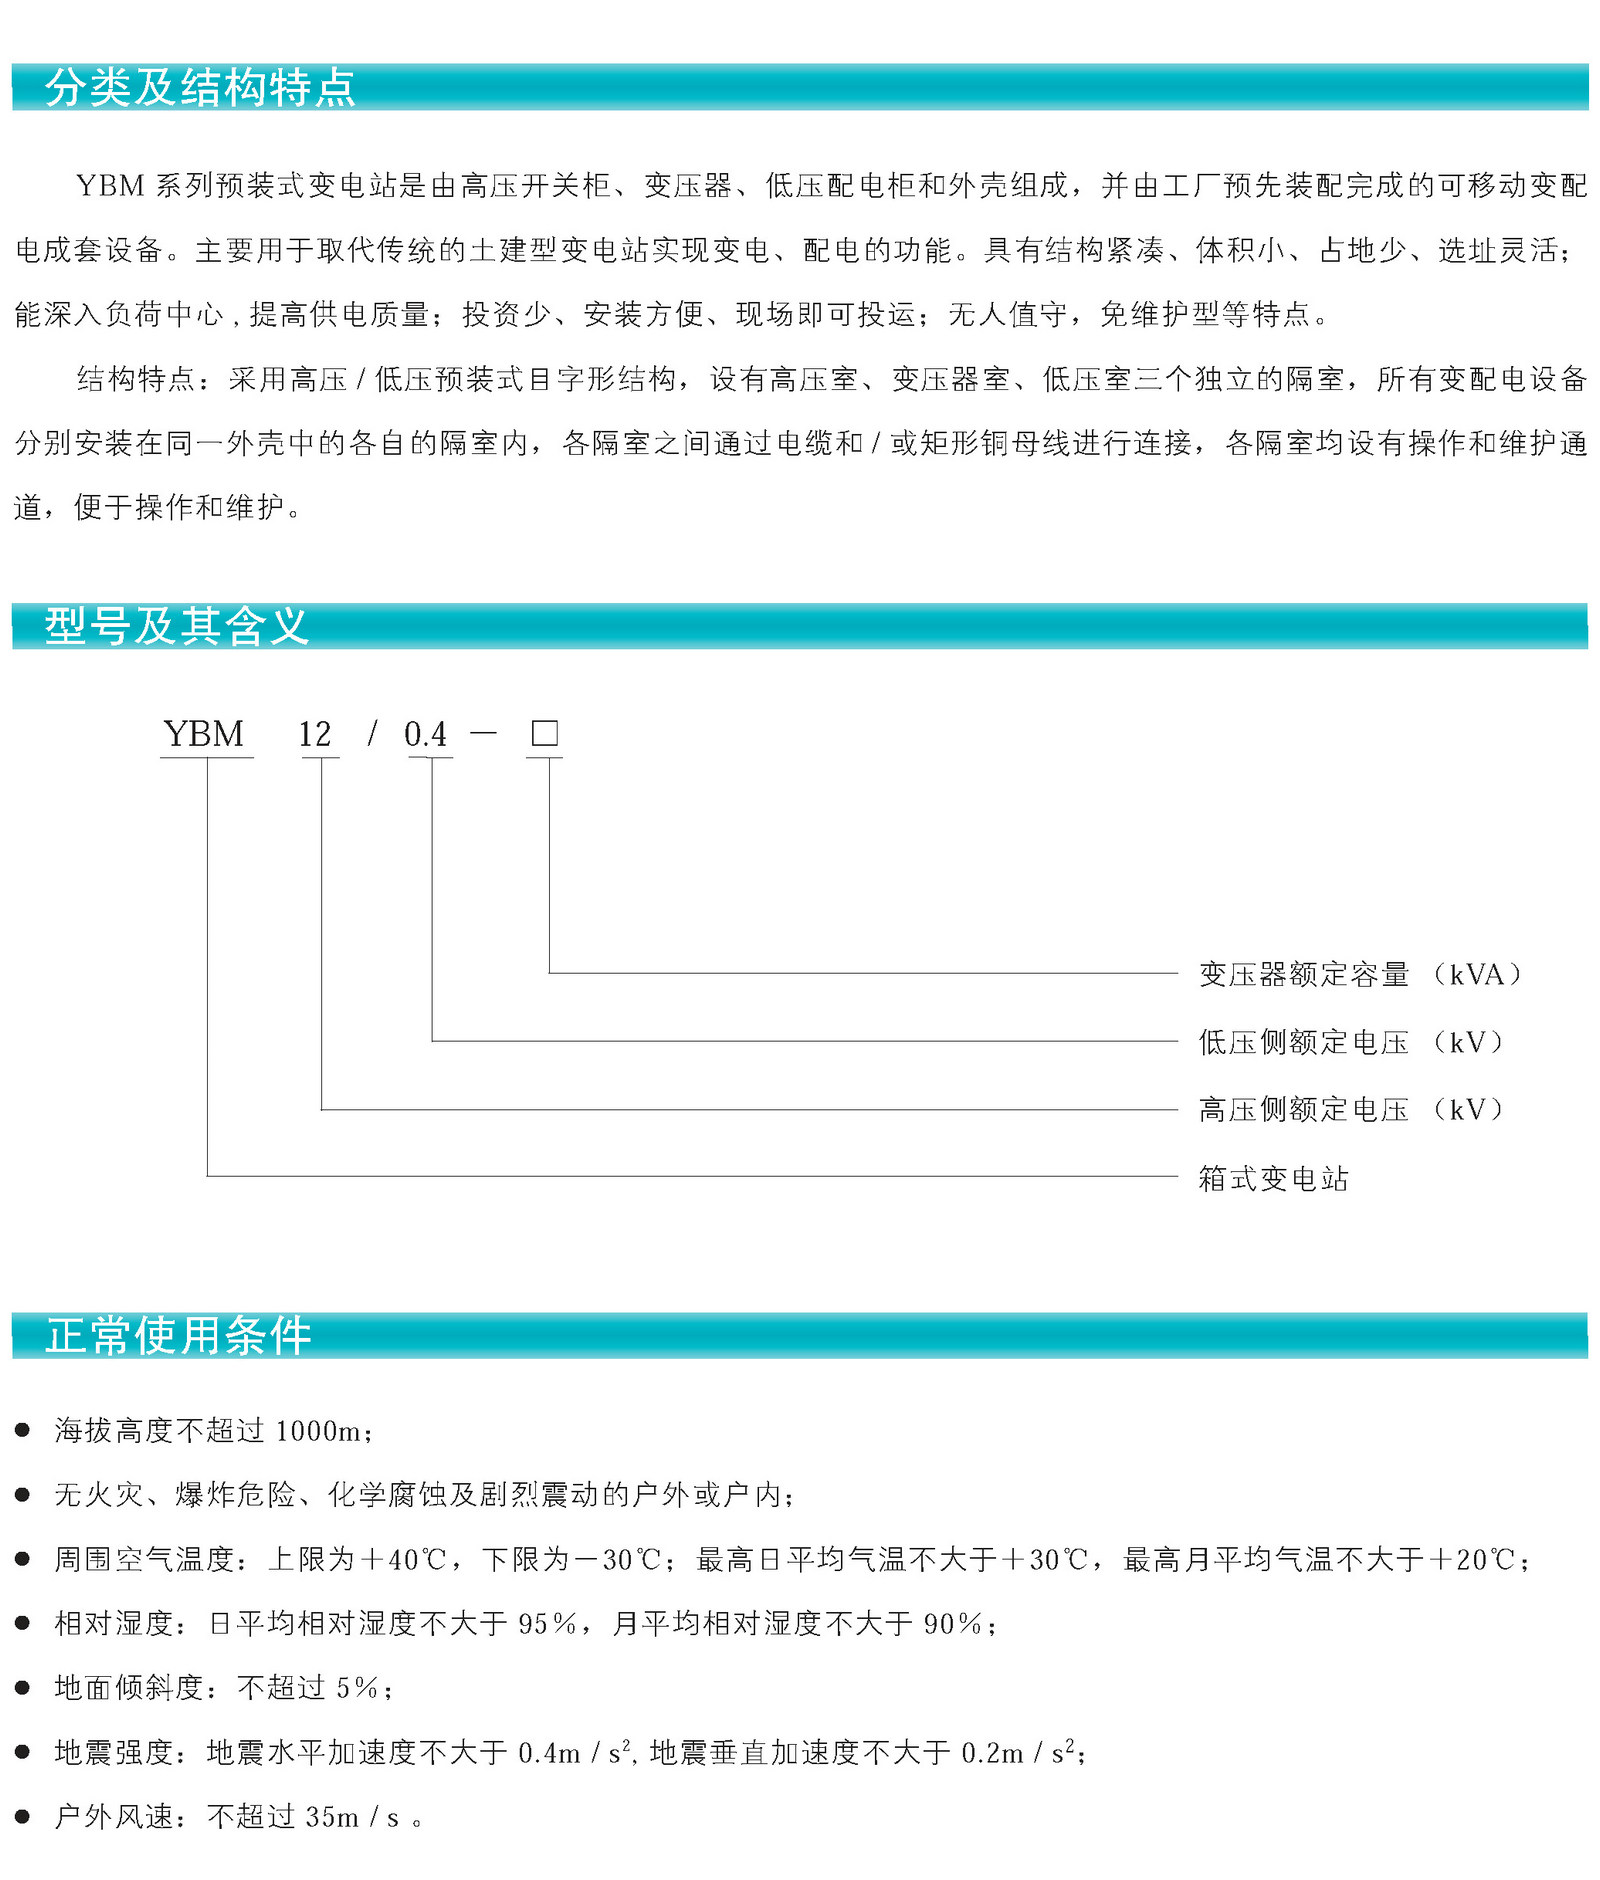 YBM系列箱式變電站副本2